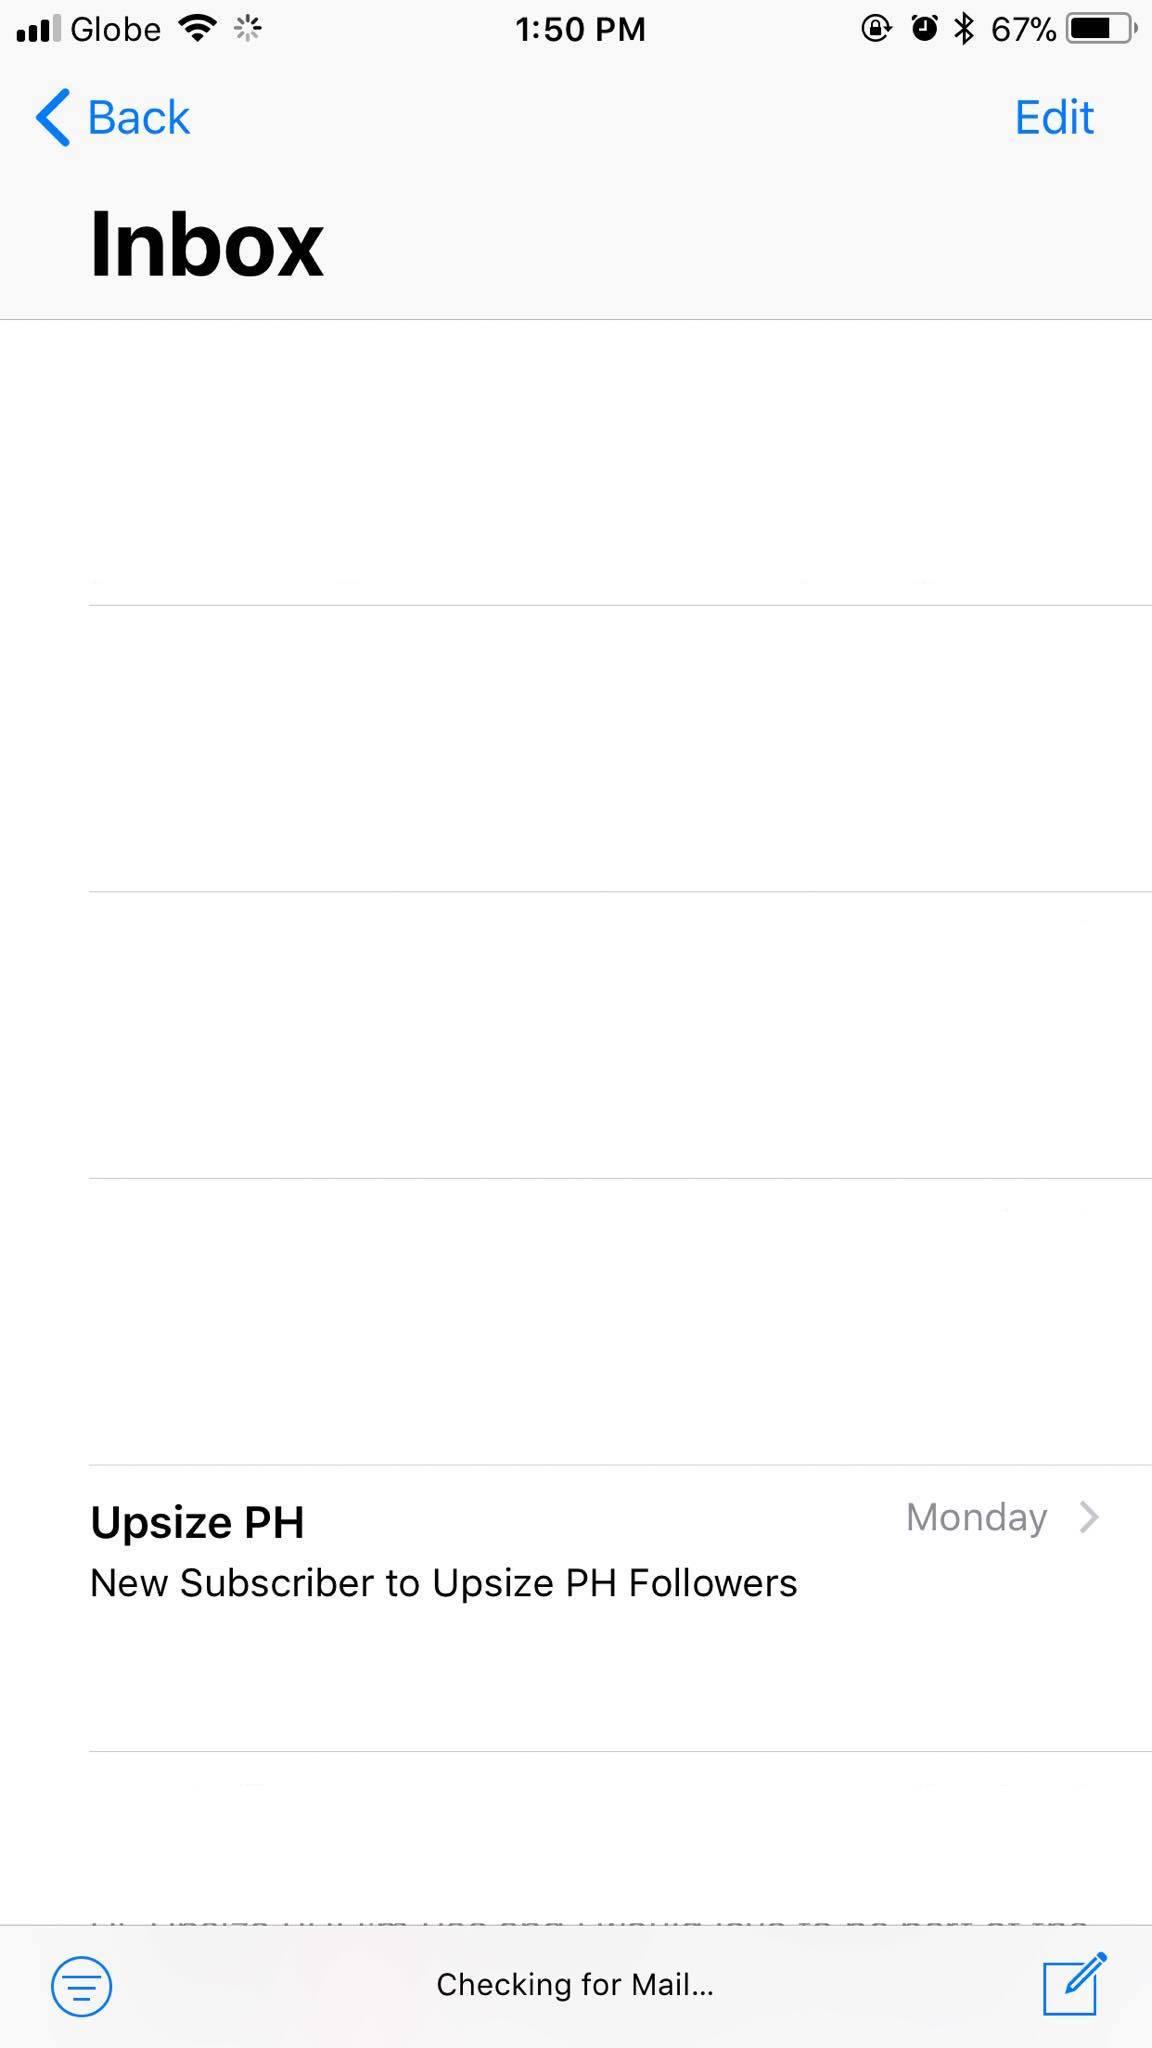 Inbox on iOS 11